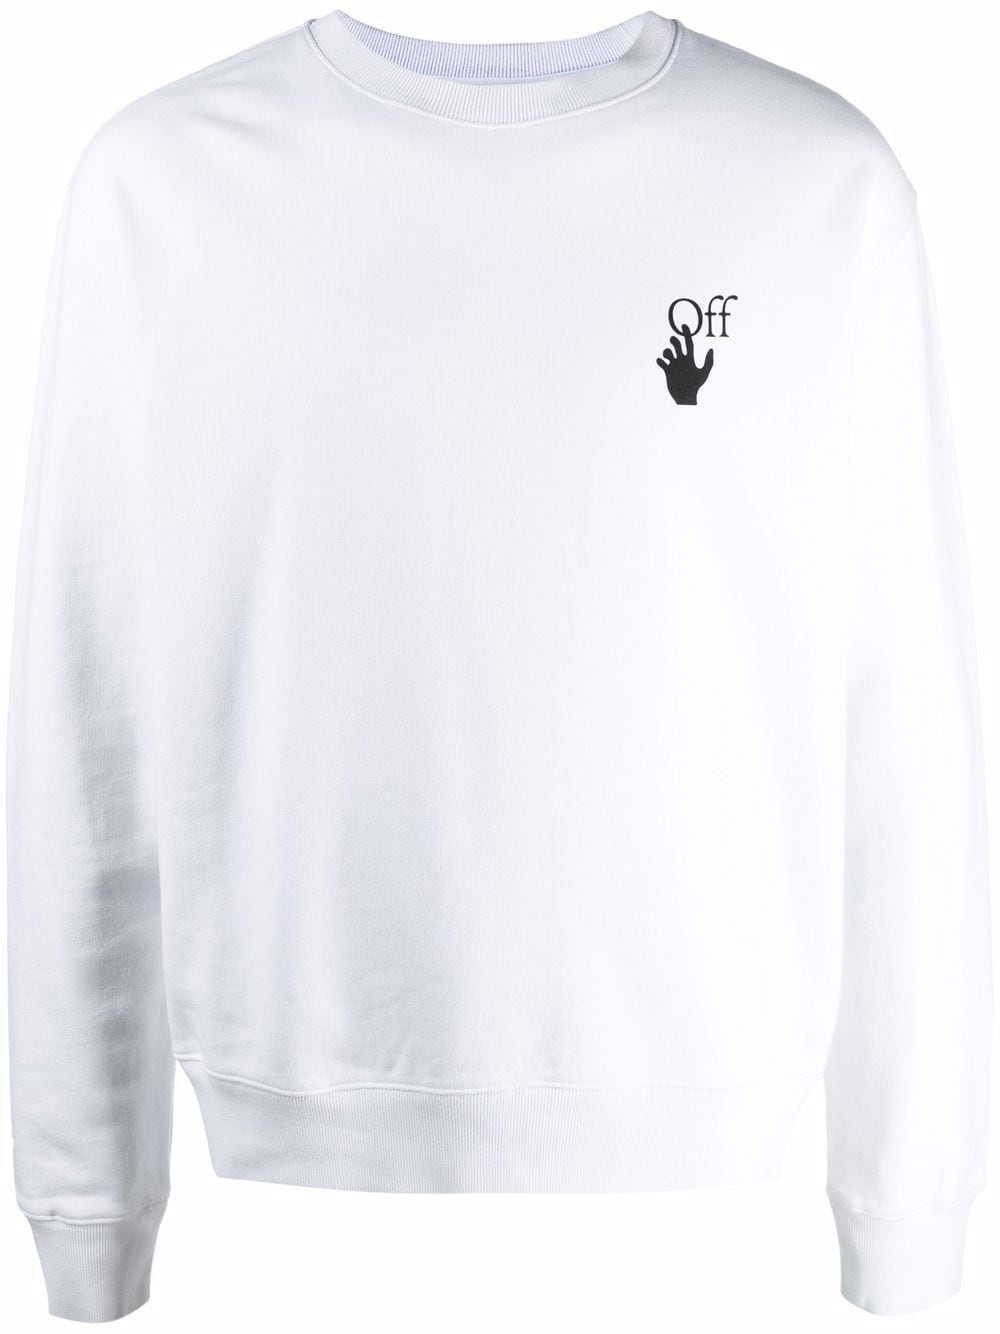 OFF-WHITE- Caravaggio Lute Cotton Sweatshirt- Man- S - White